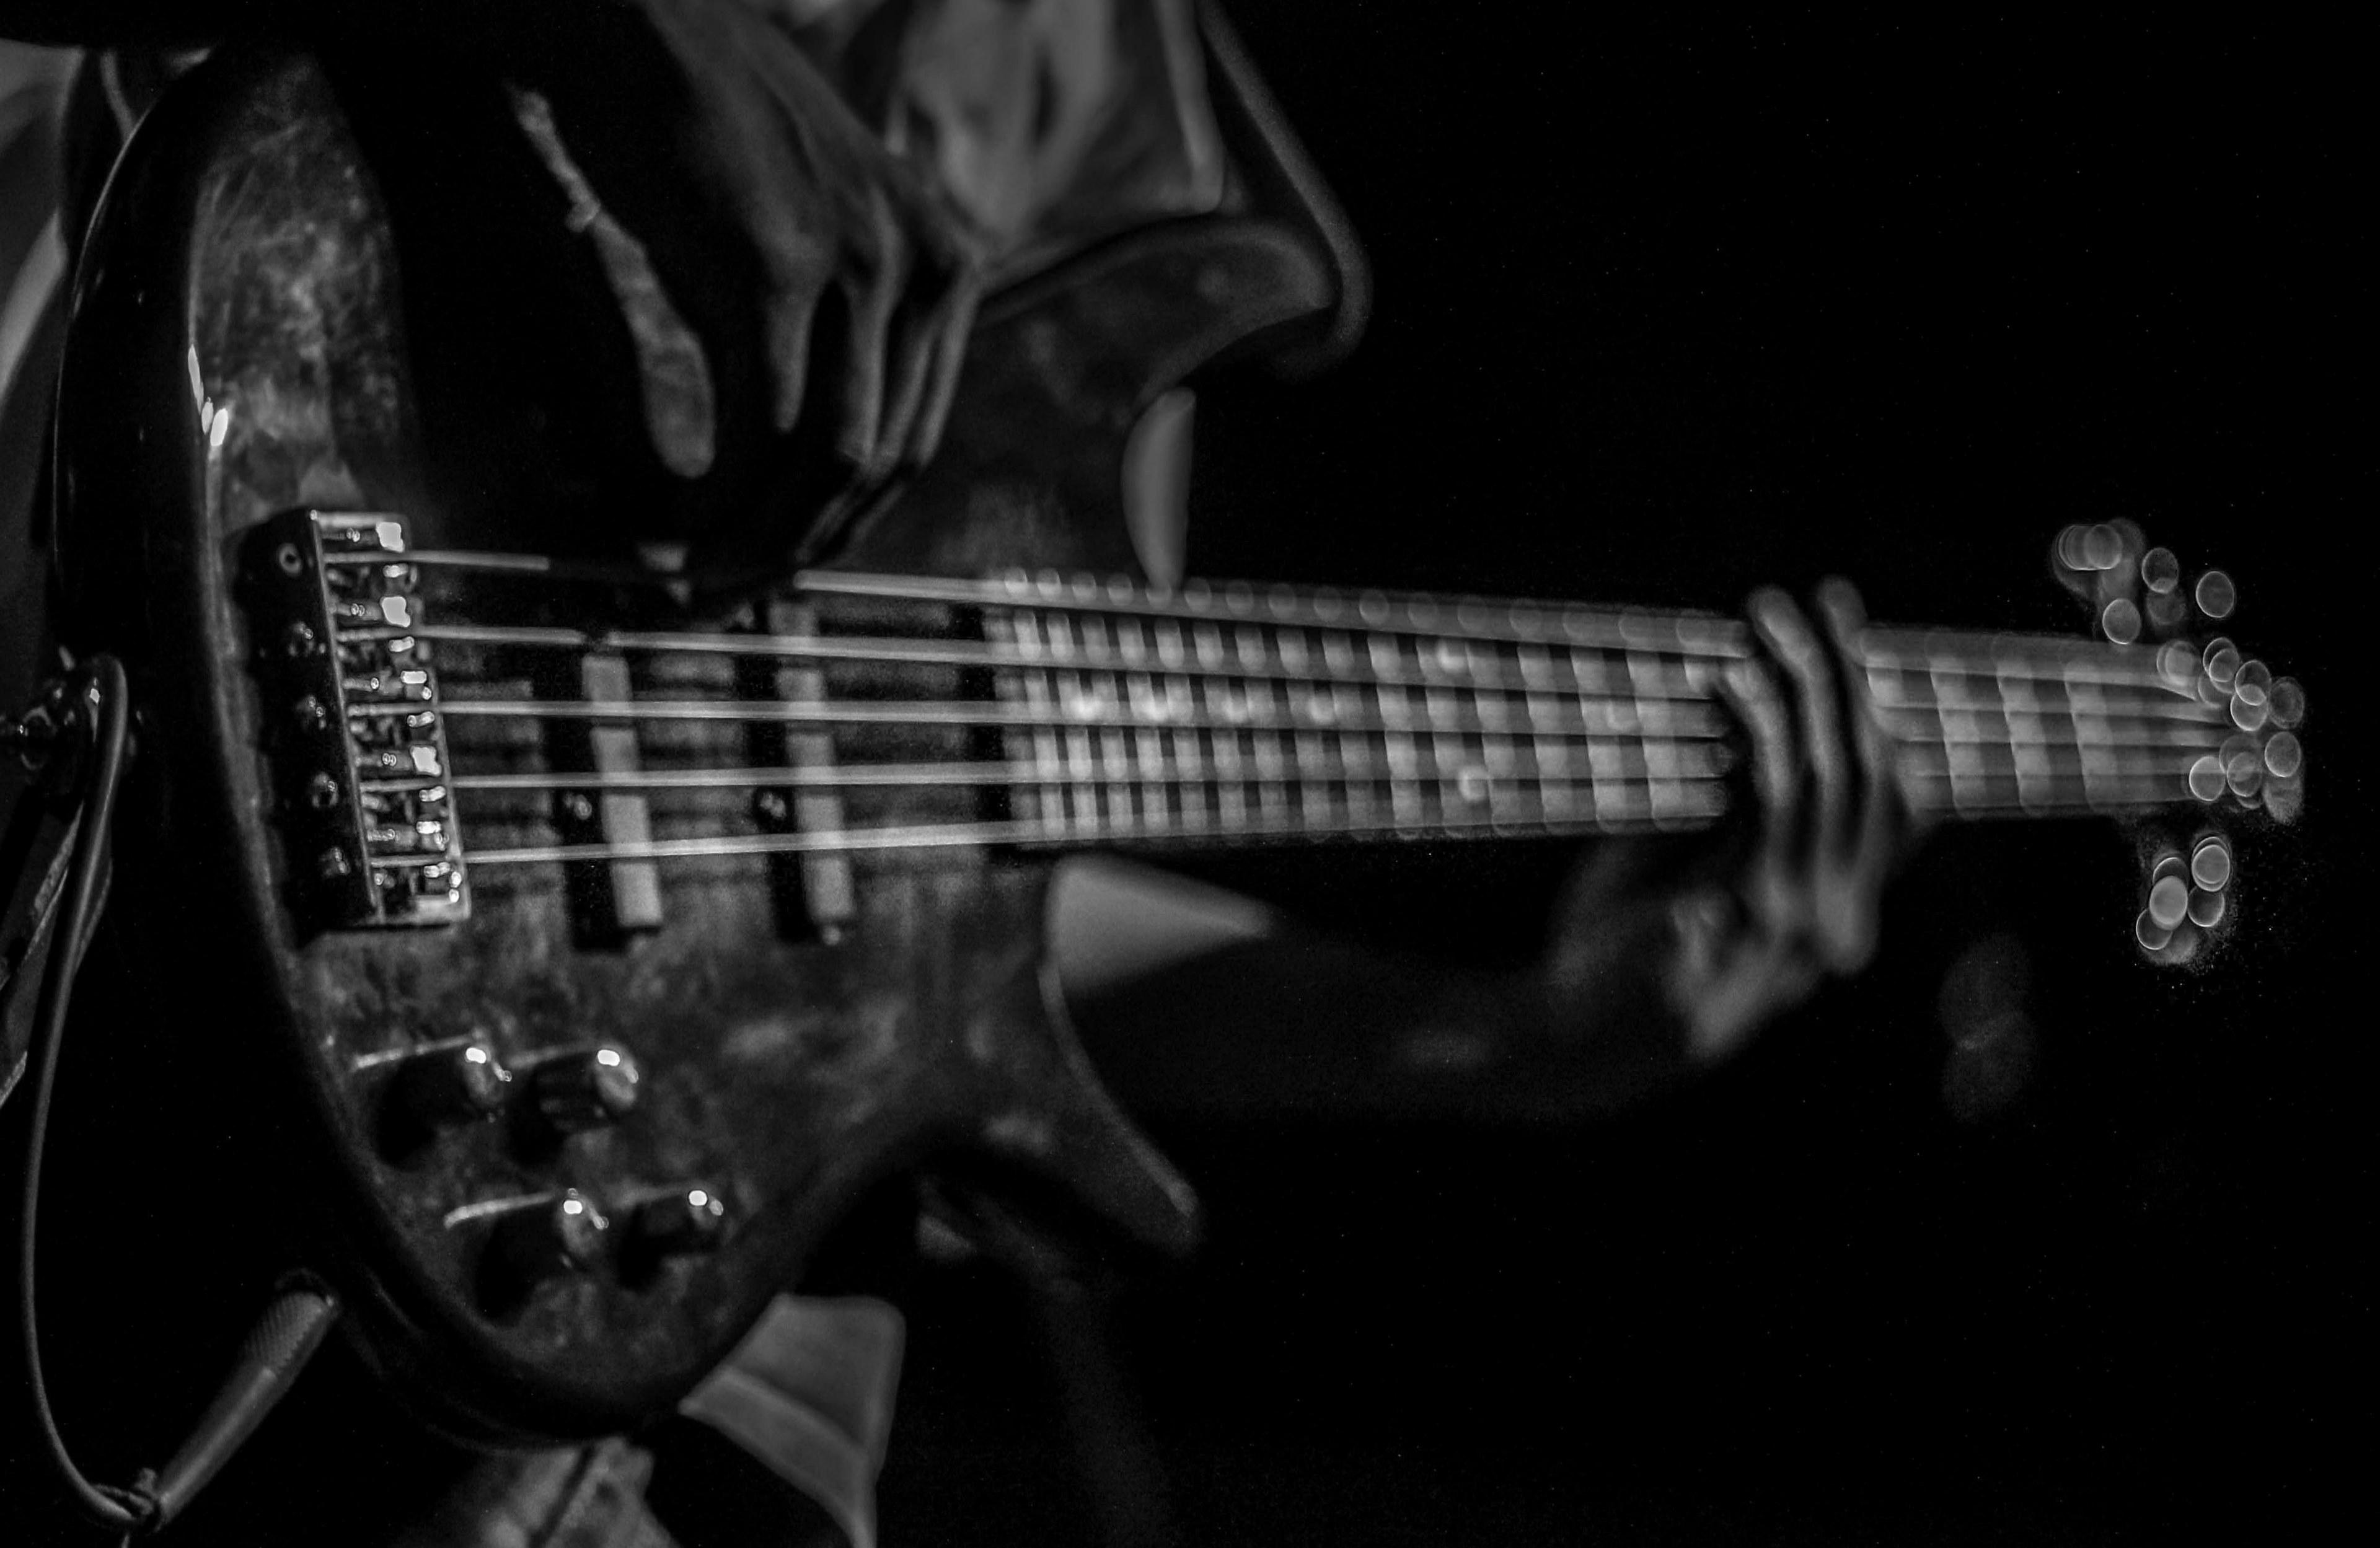 3840x2498 Band Bass Death And Metal Hd 4k Wallpaper Bass Guitar Wallpaper 4k 2103936 Hd Wallpaper Backgrounds Download